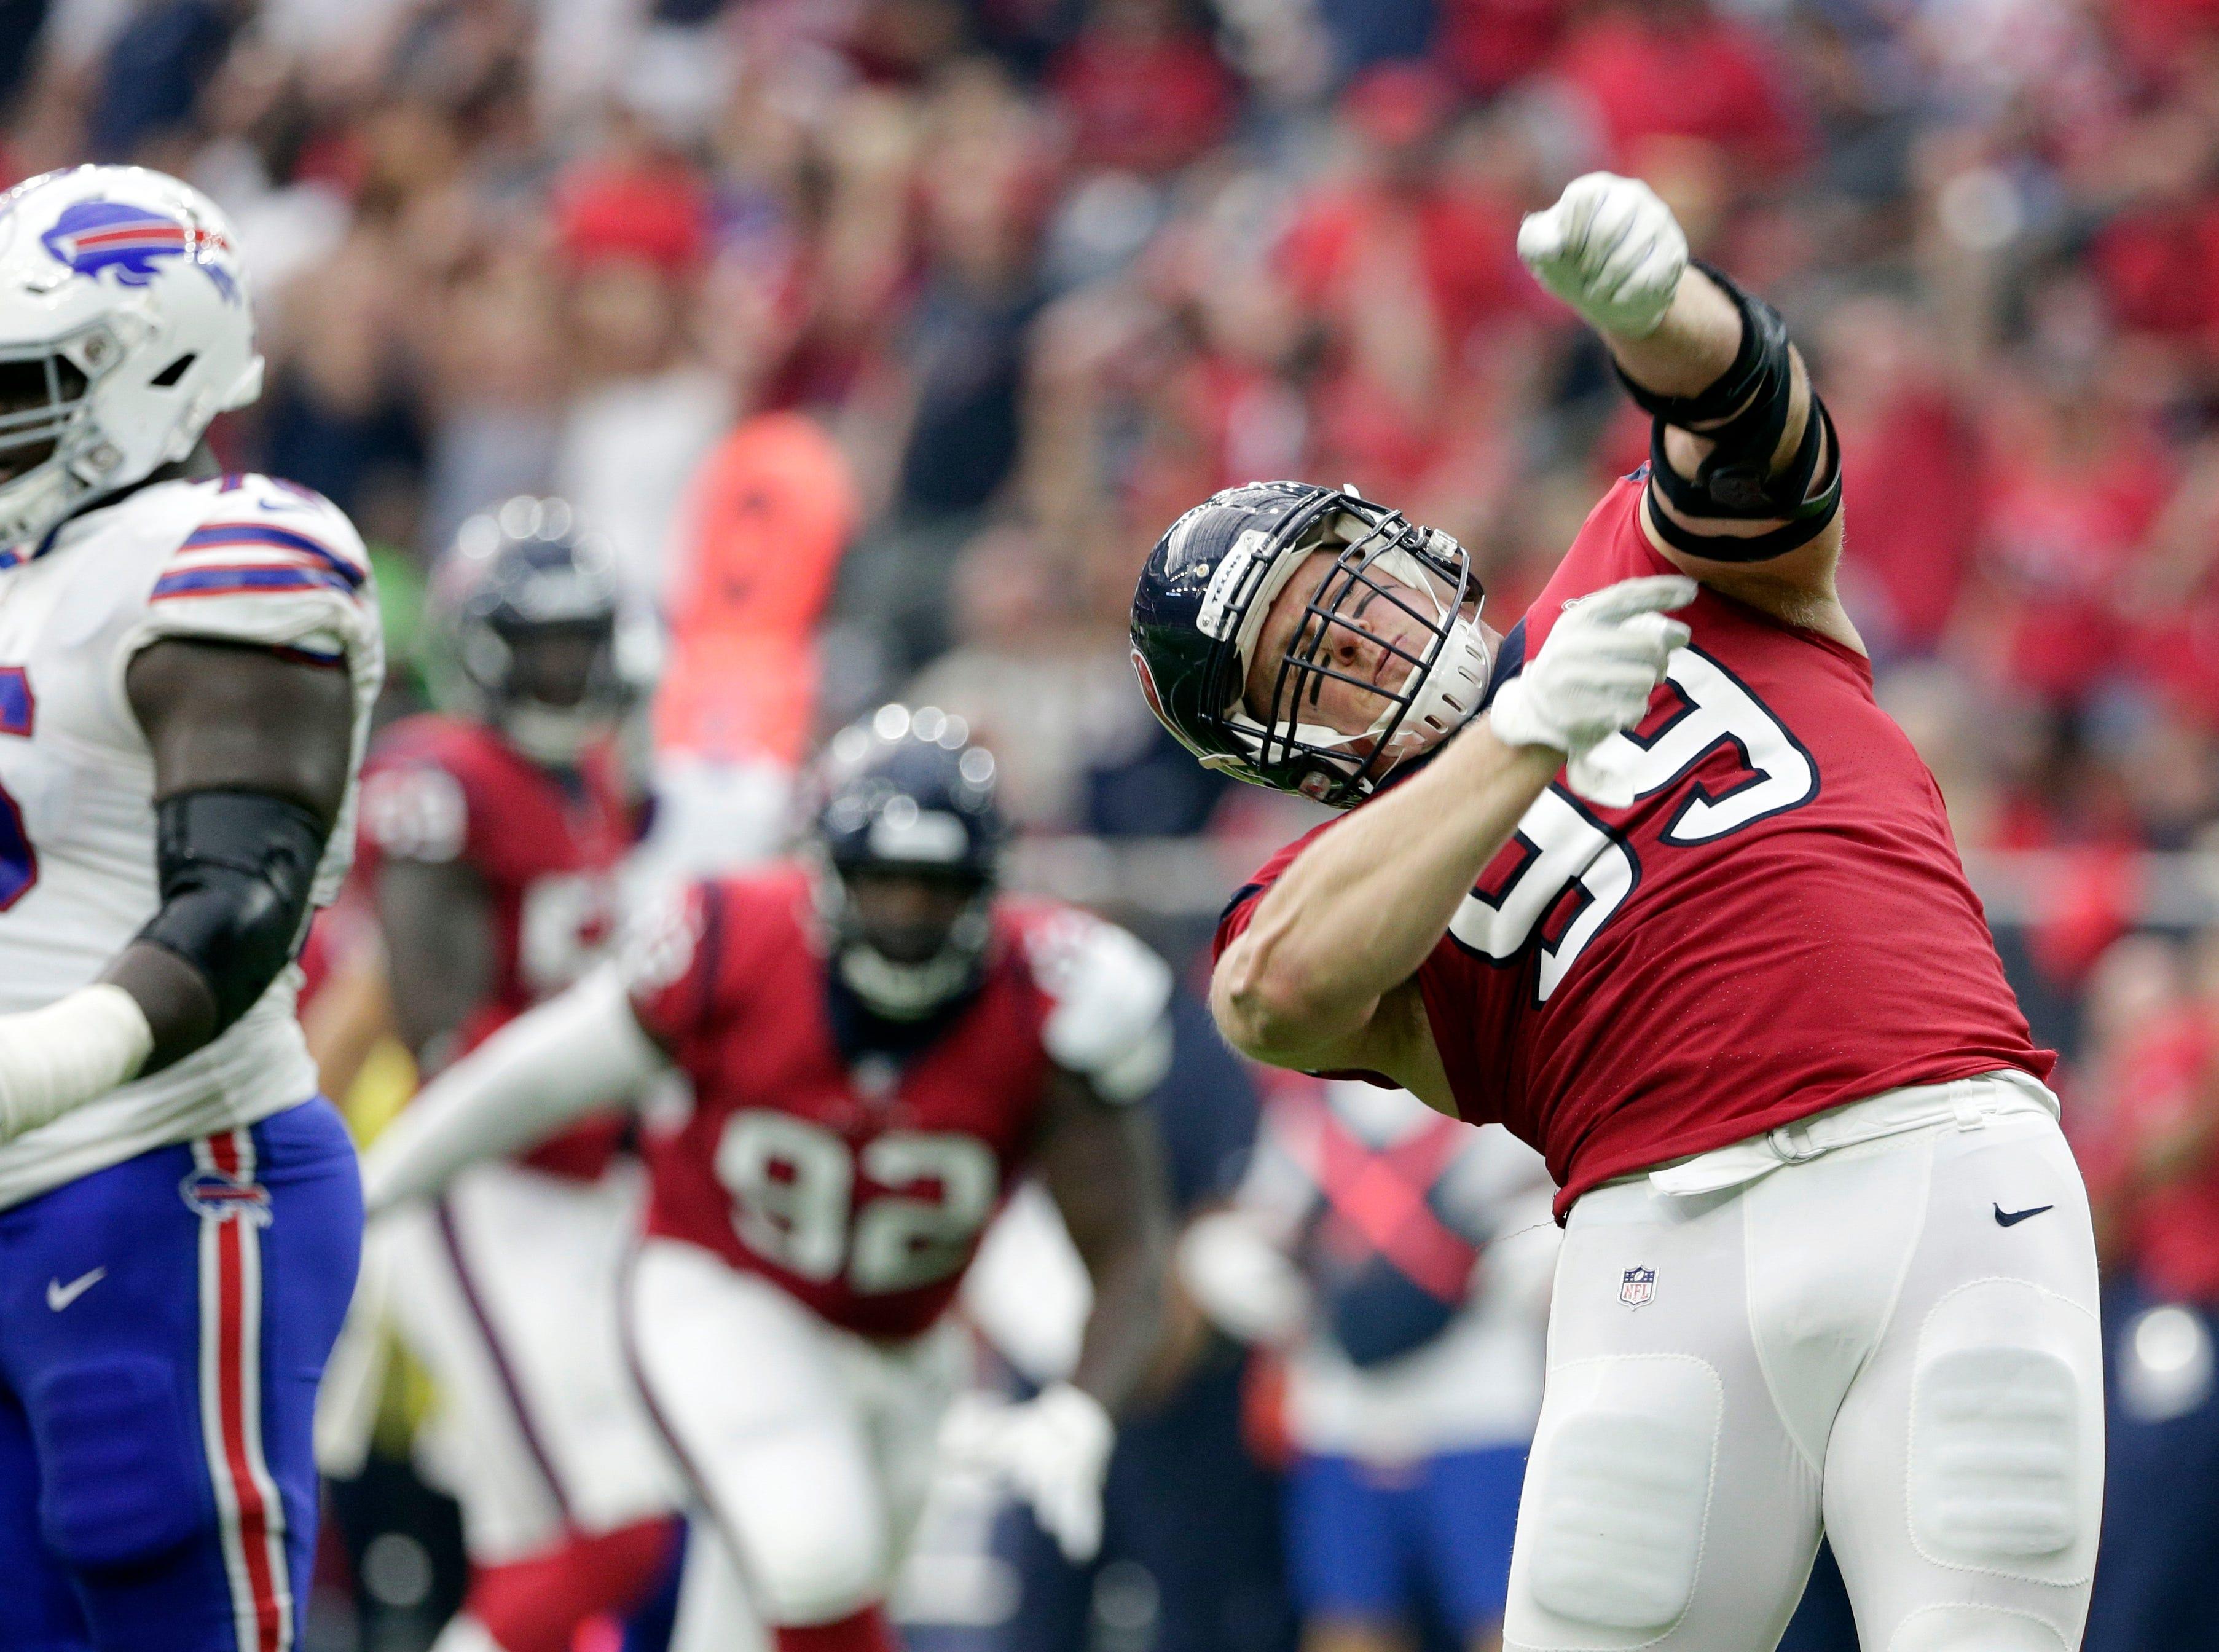 Houston Texans defensive end J.J. Watt (99) celebrates after he sacked Buffalo Bills quarterback Josh Allen during the first half of an NFL football game, Sunday, Oct. 14, 2018, in Houston. (AP Photo/Michael Wyke)